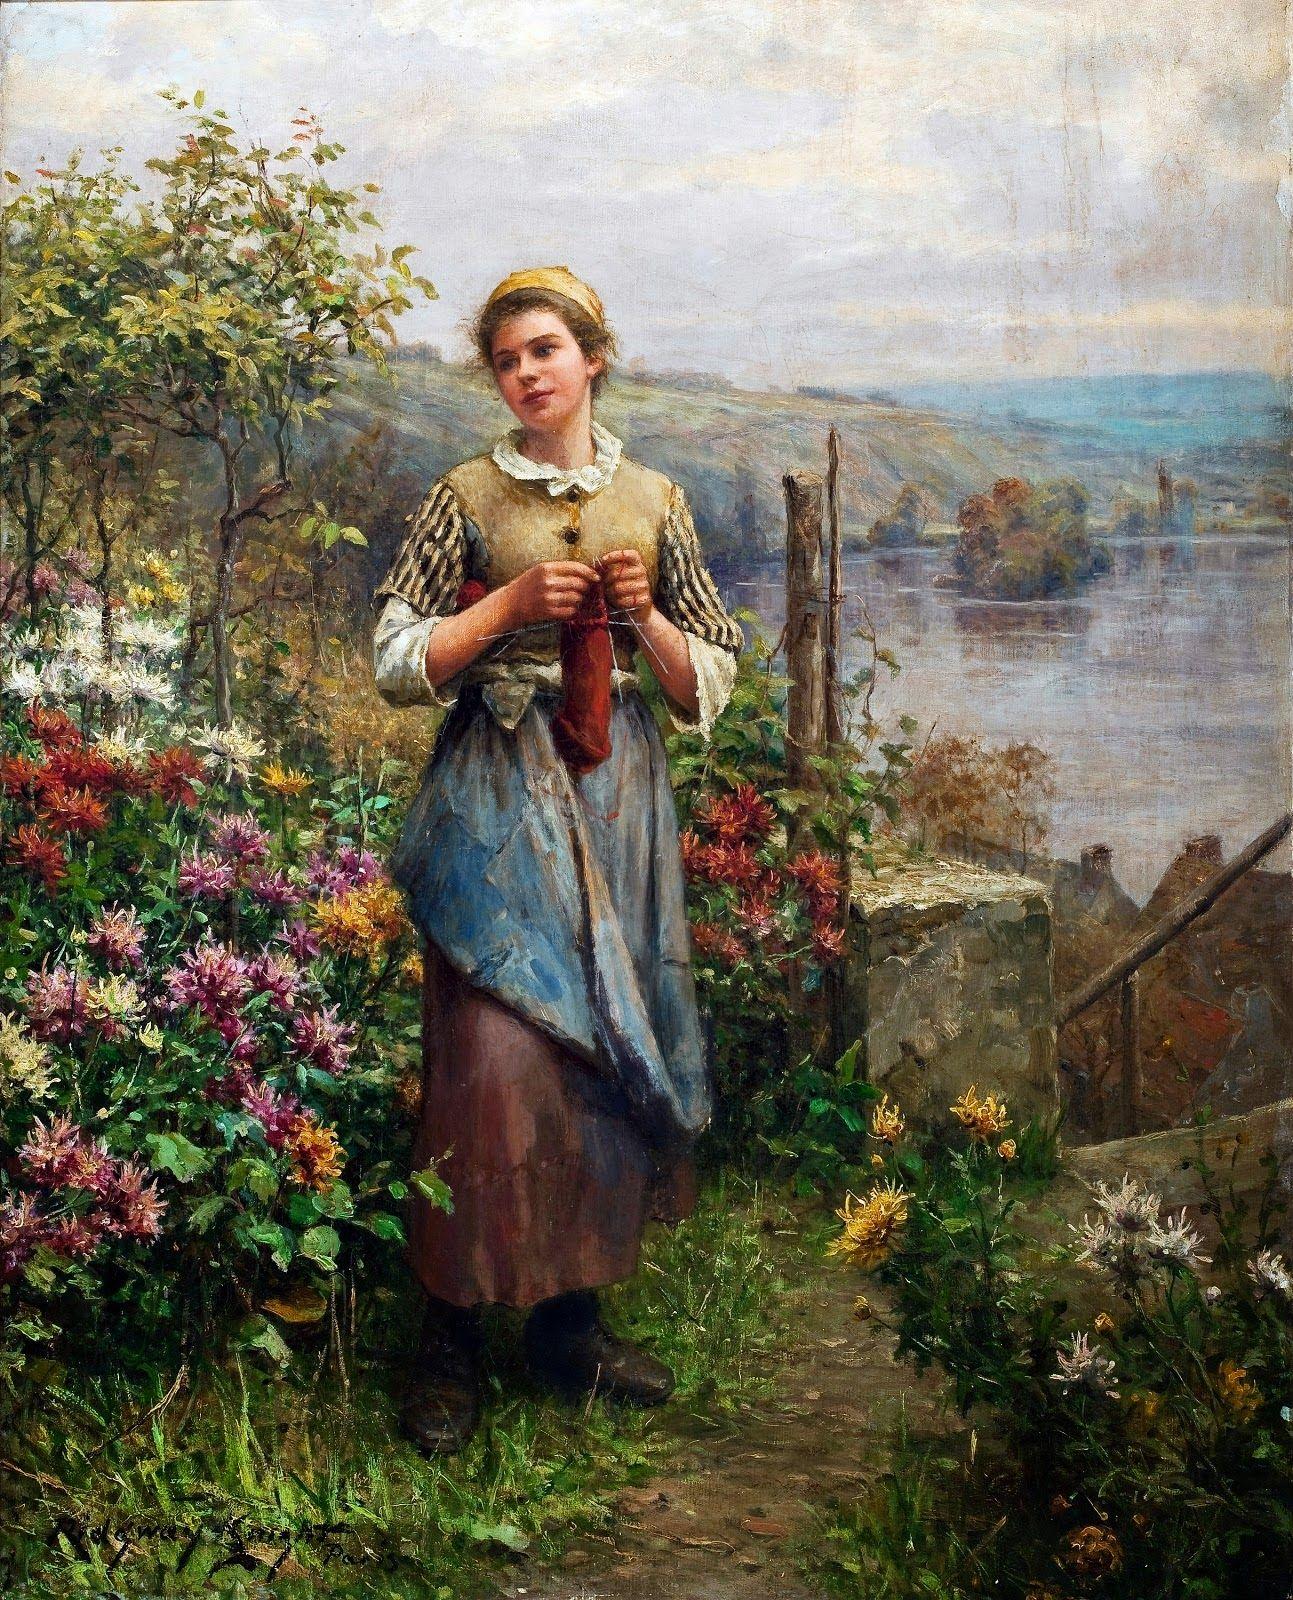 Daniel+Ridgway+Knight+-+Young+Woman+Knitting.jpg (1293×1600)